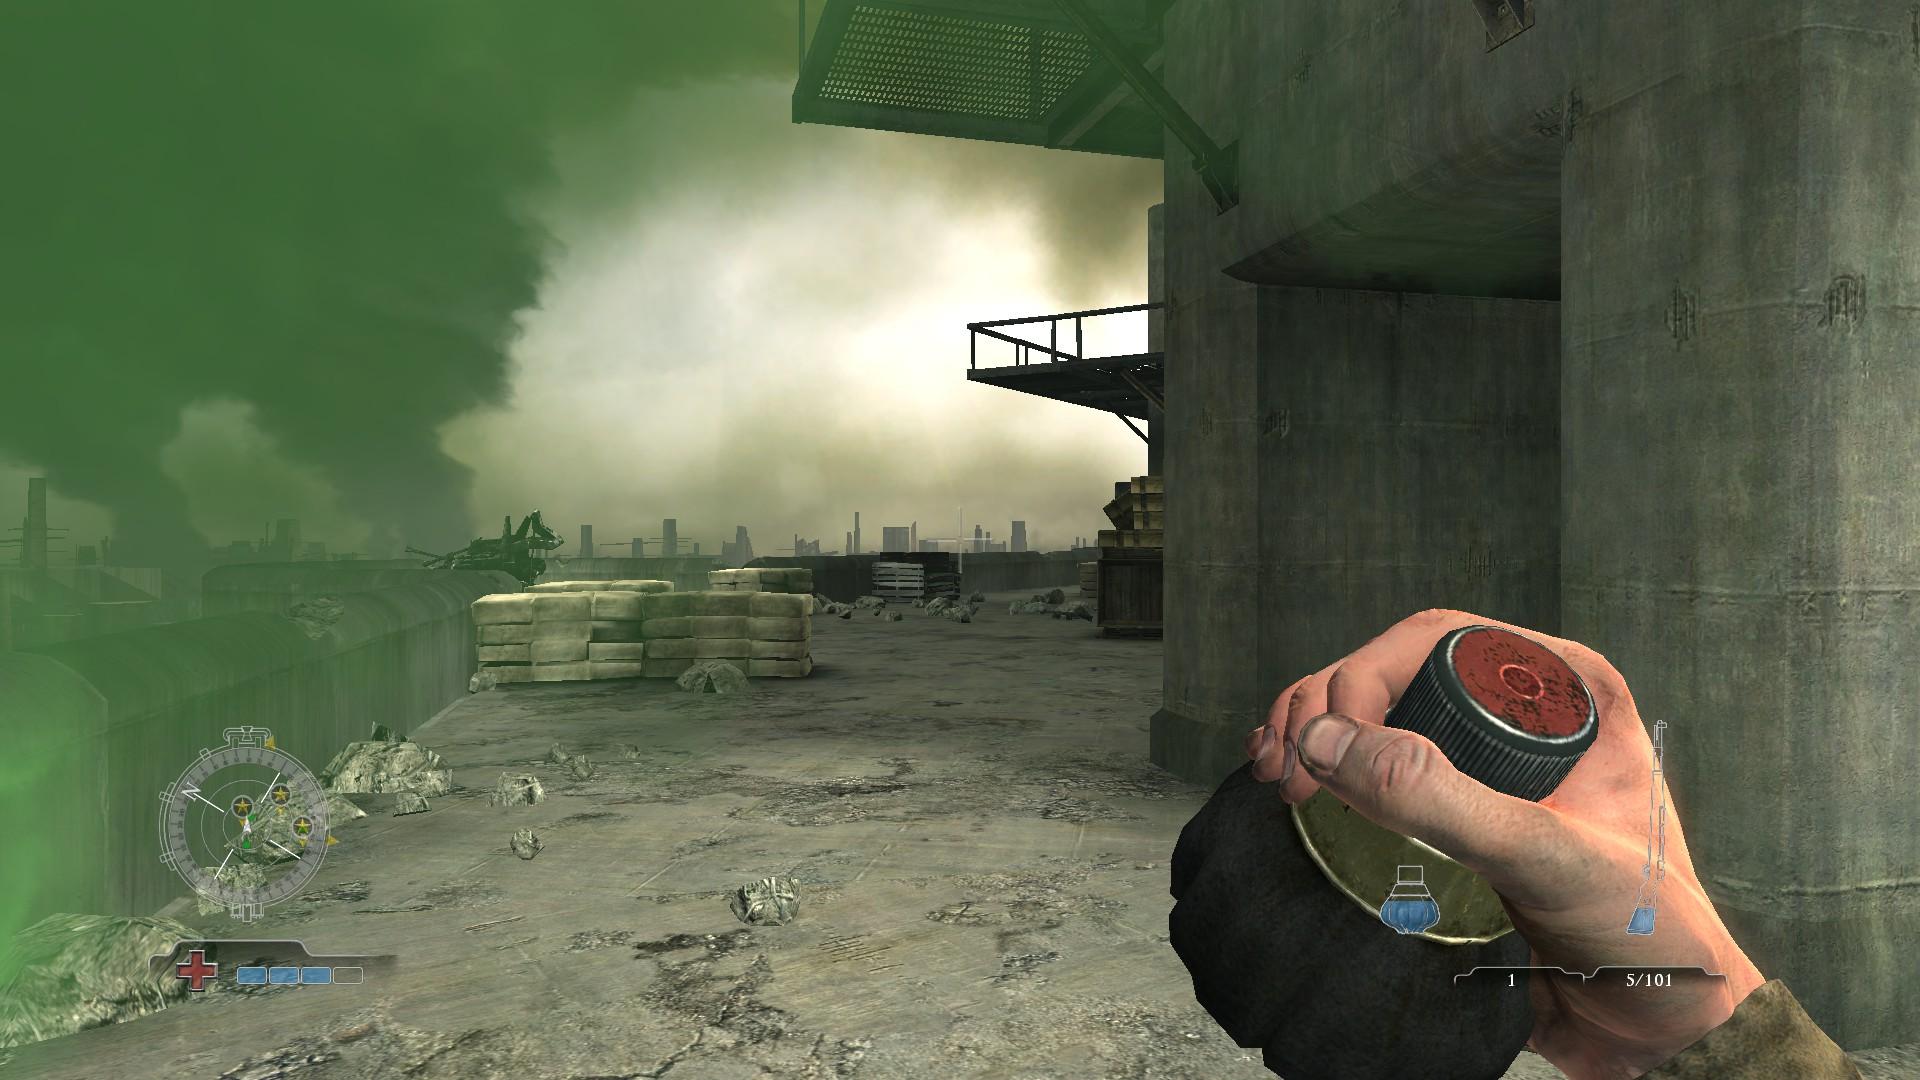 Gammon grenade